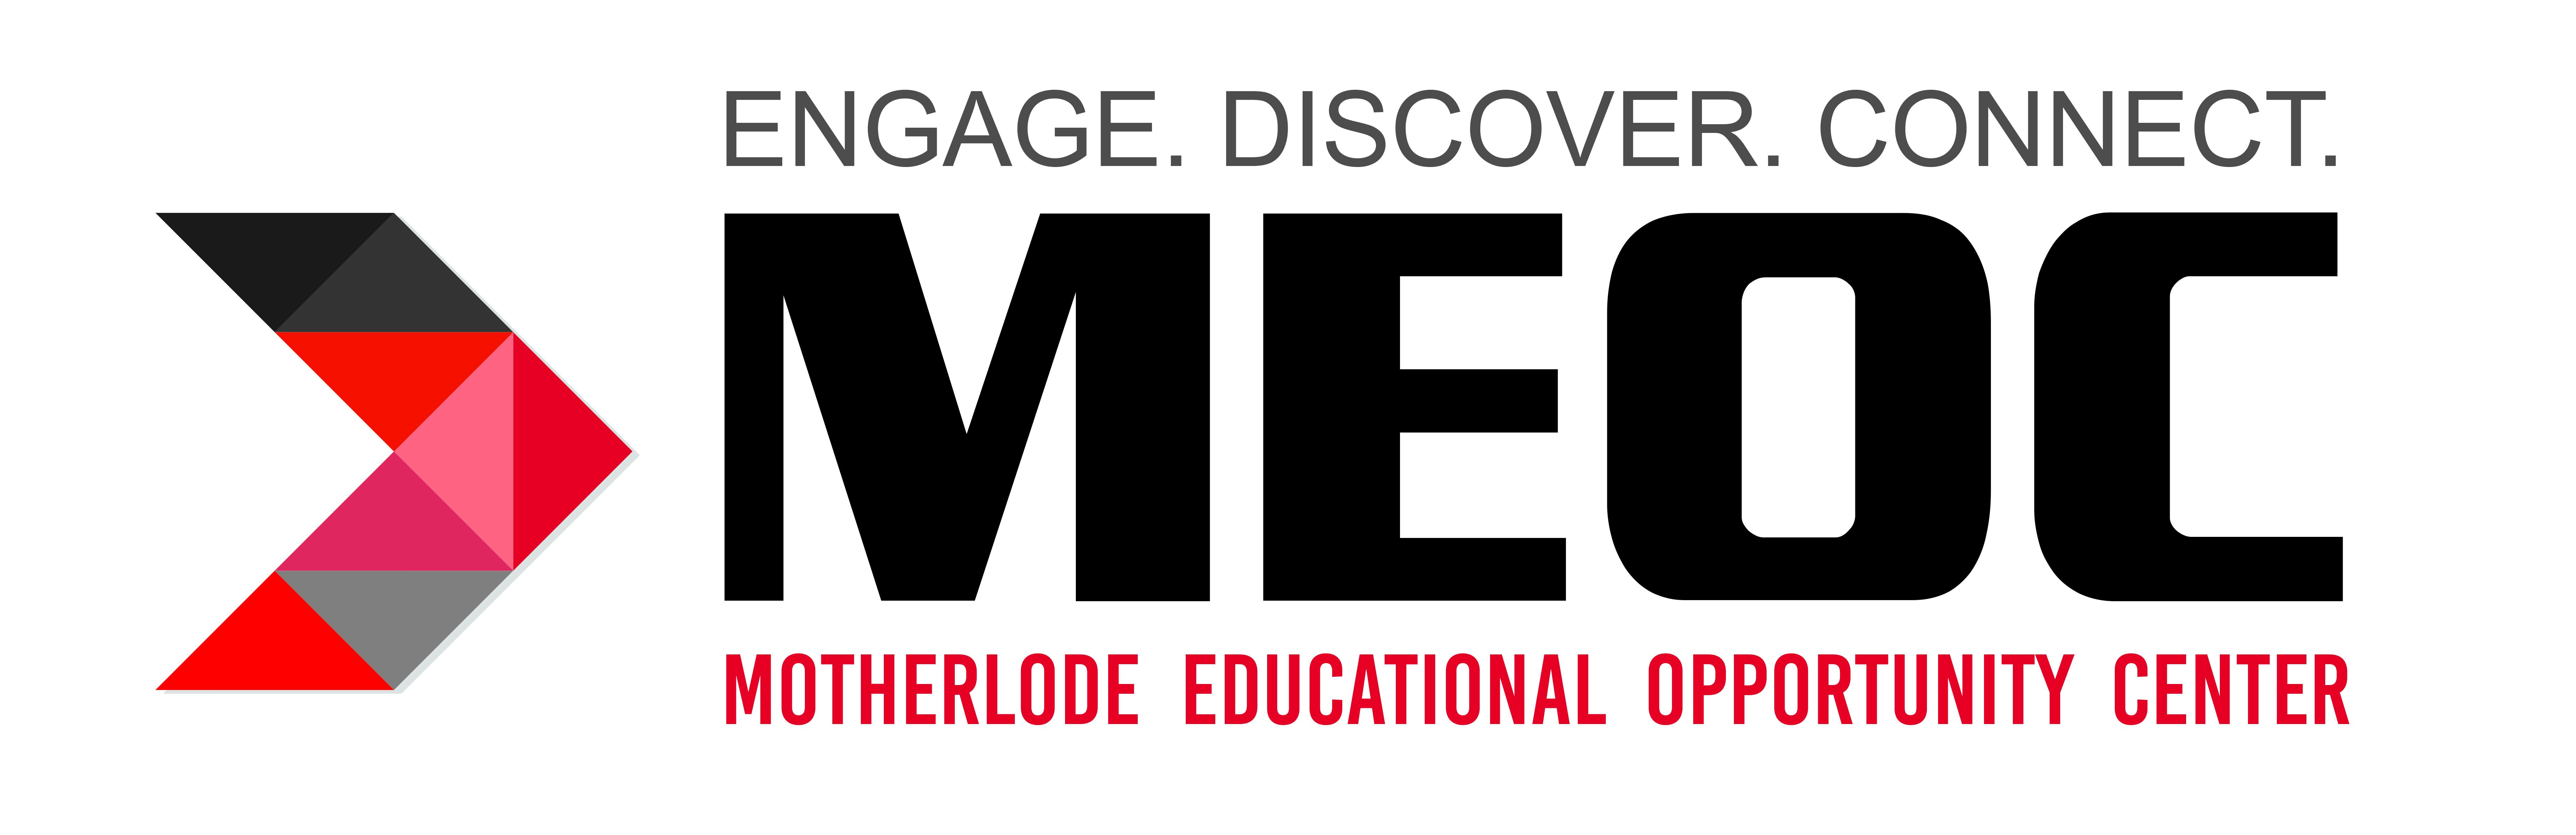 MEOC logo